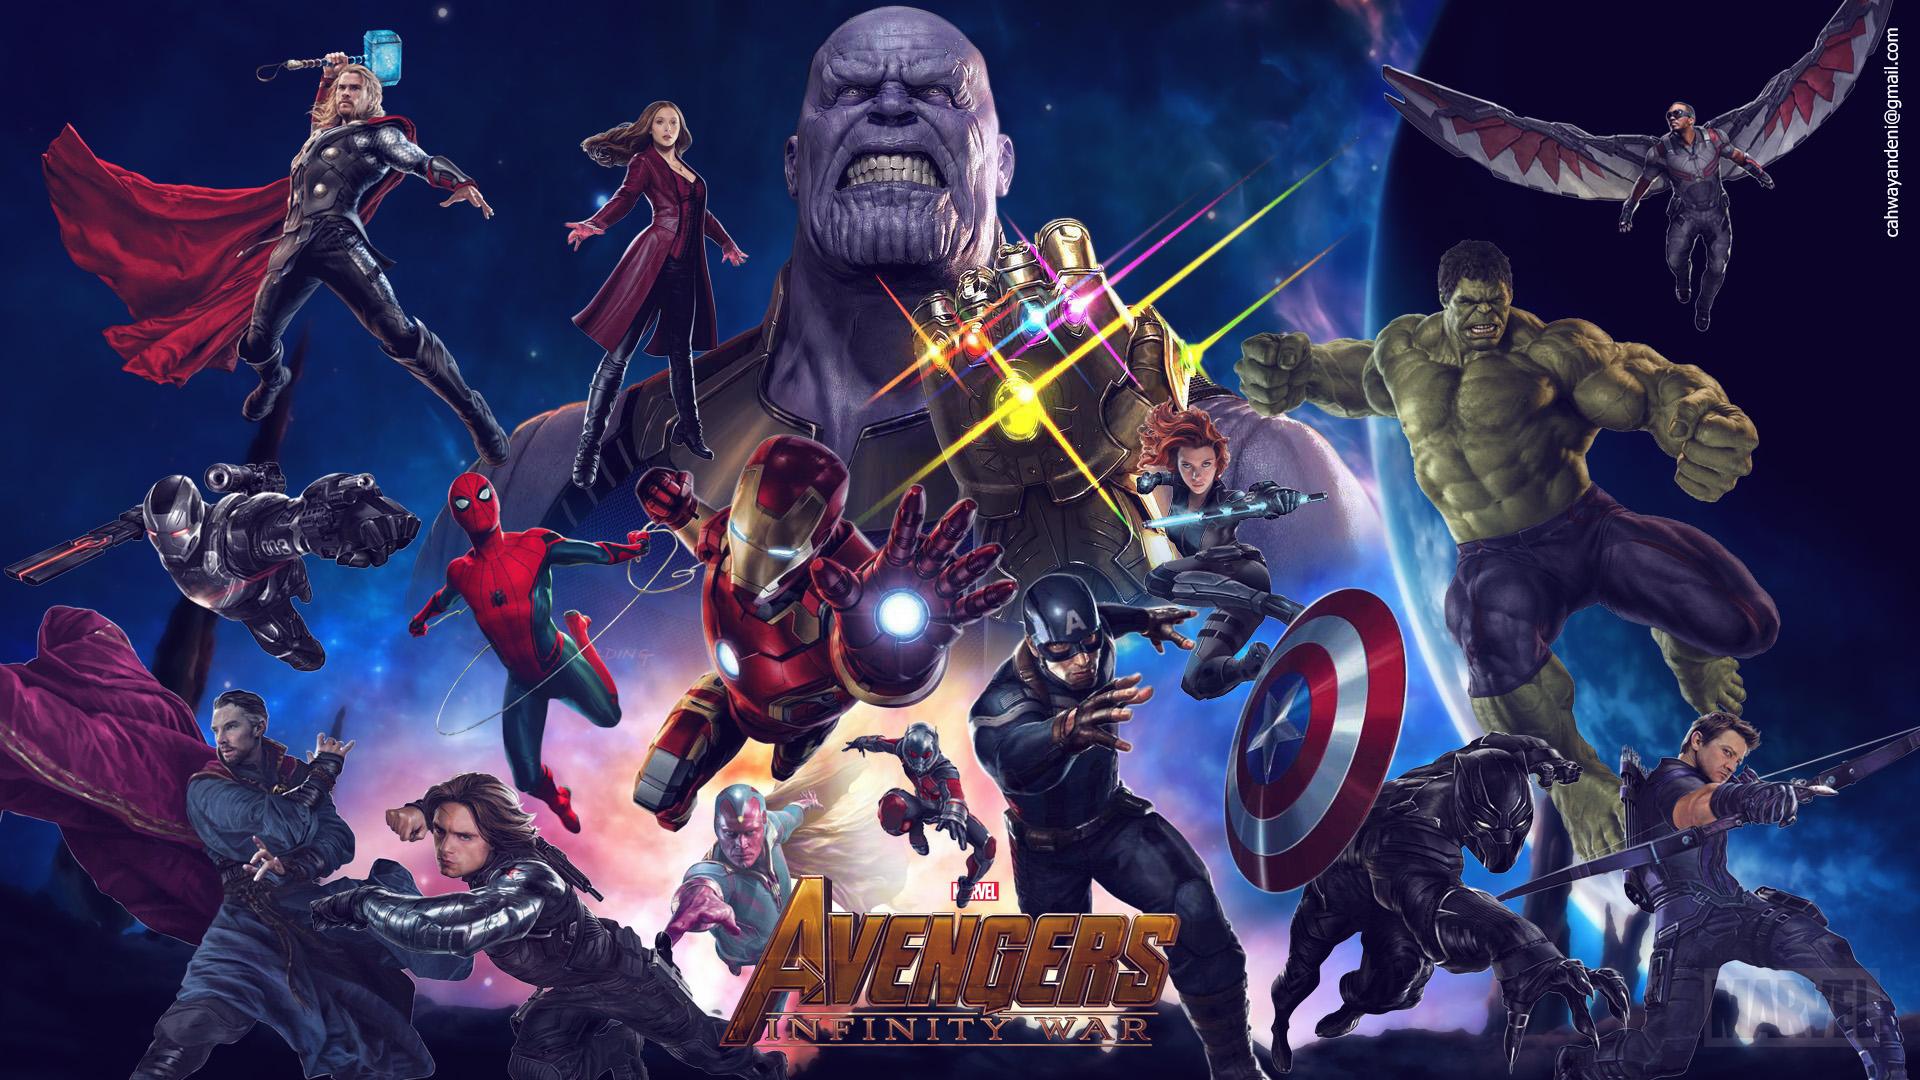 Most Inspiring Vision Wanda Infinity War Wallpaper - 887363  Trends_469497 .jpg